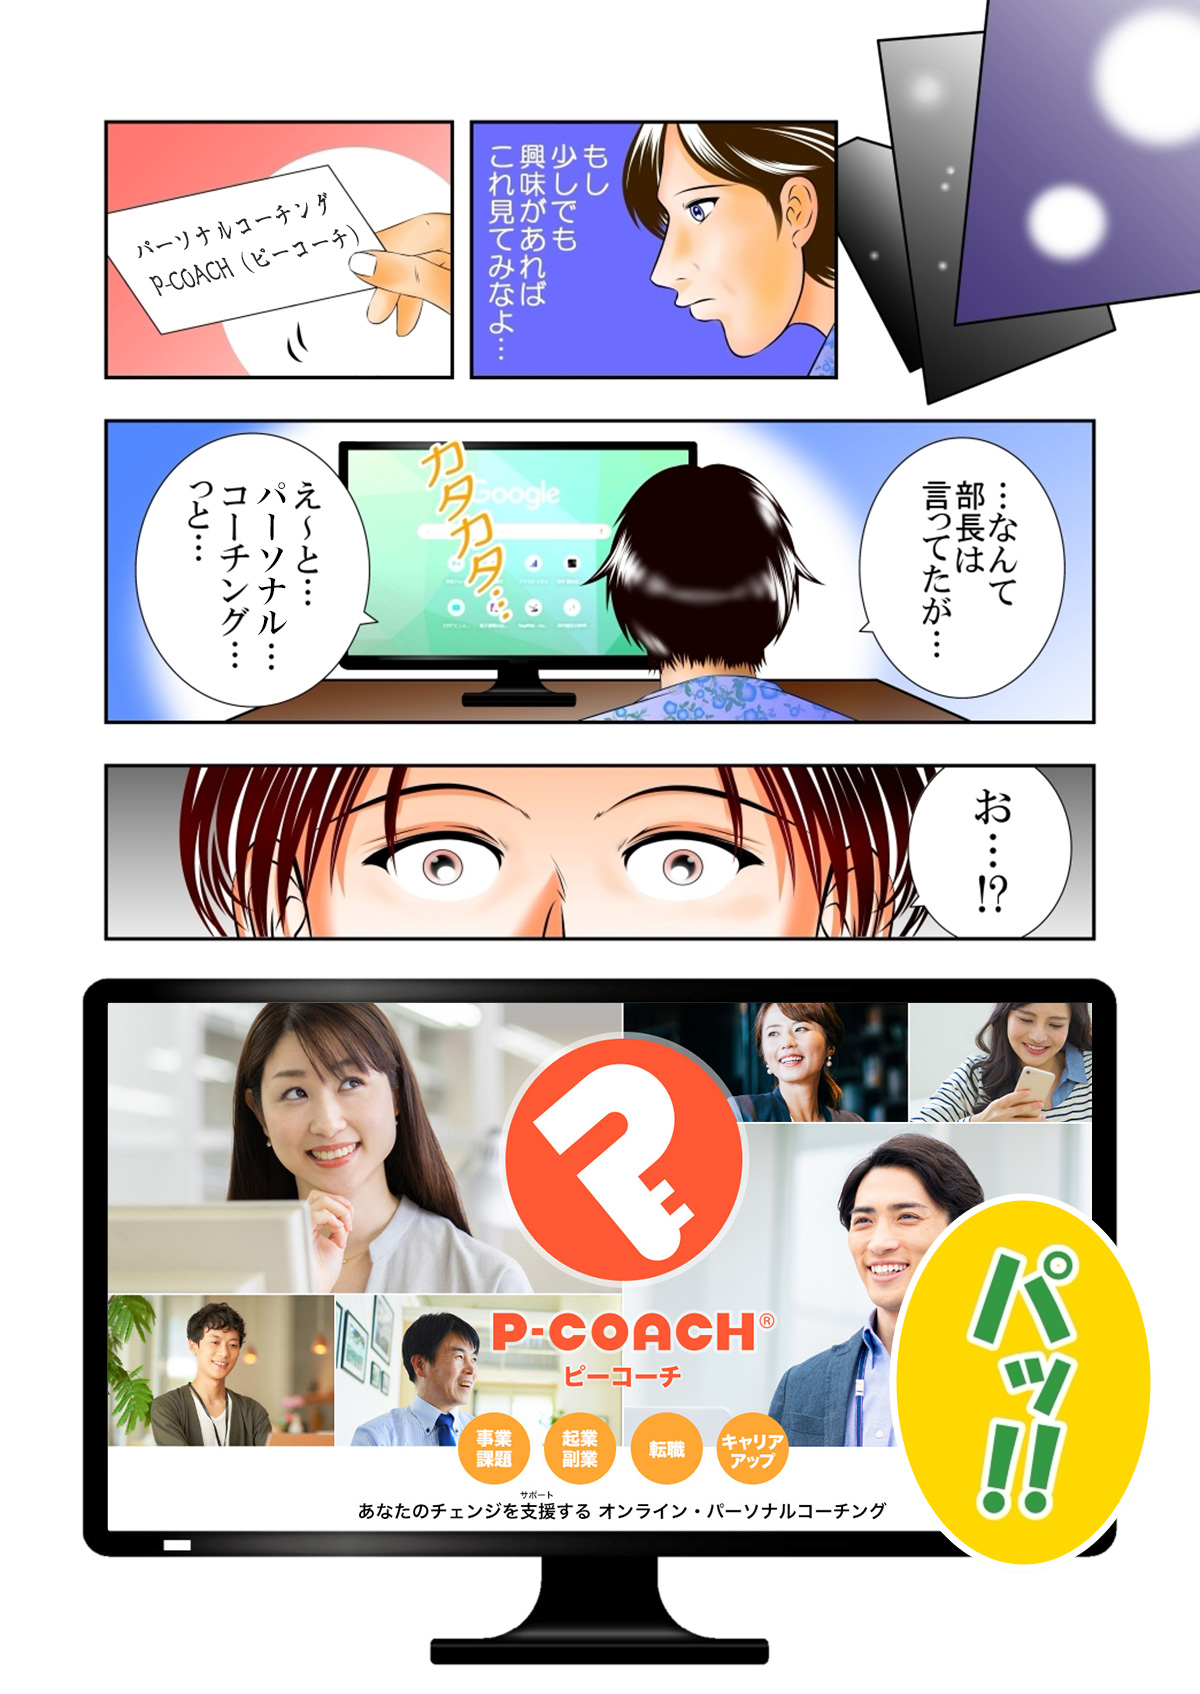 《P-COACH》体験漫画「47歳 ある営業企画課長の場合」P4